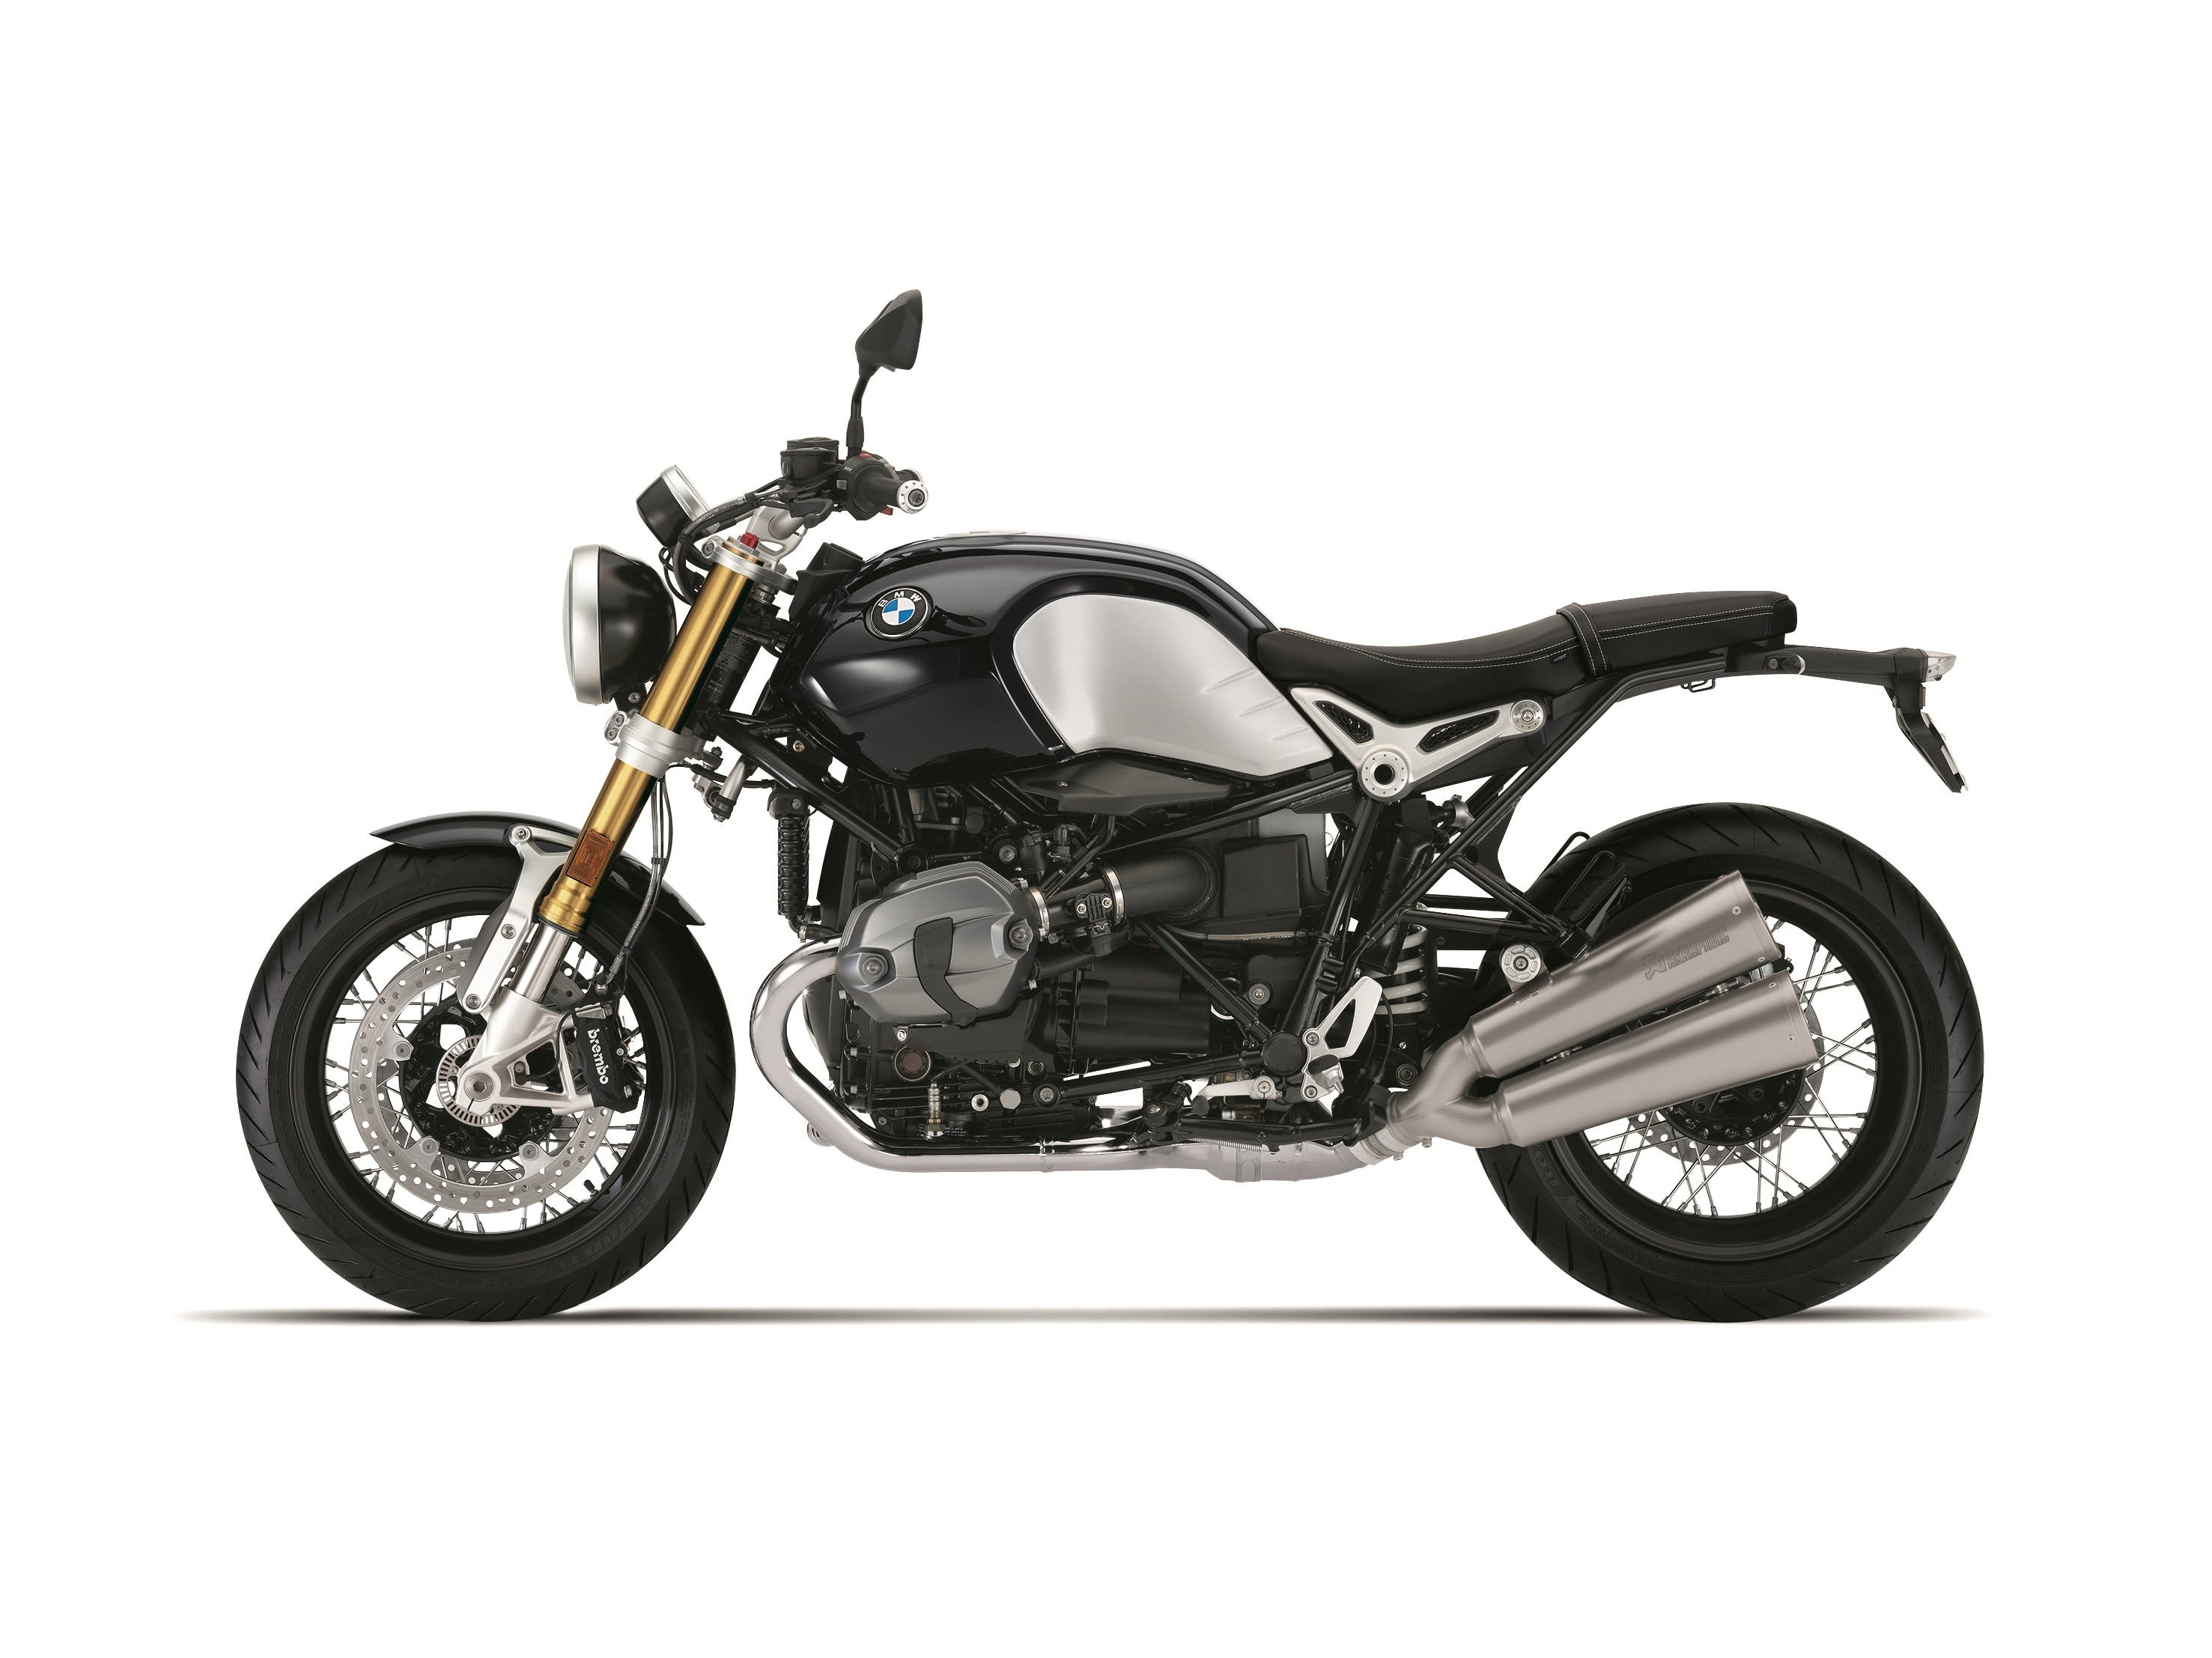 BMW R NINET SPEZIAL in black storm metallic colour